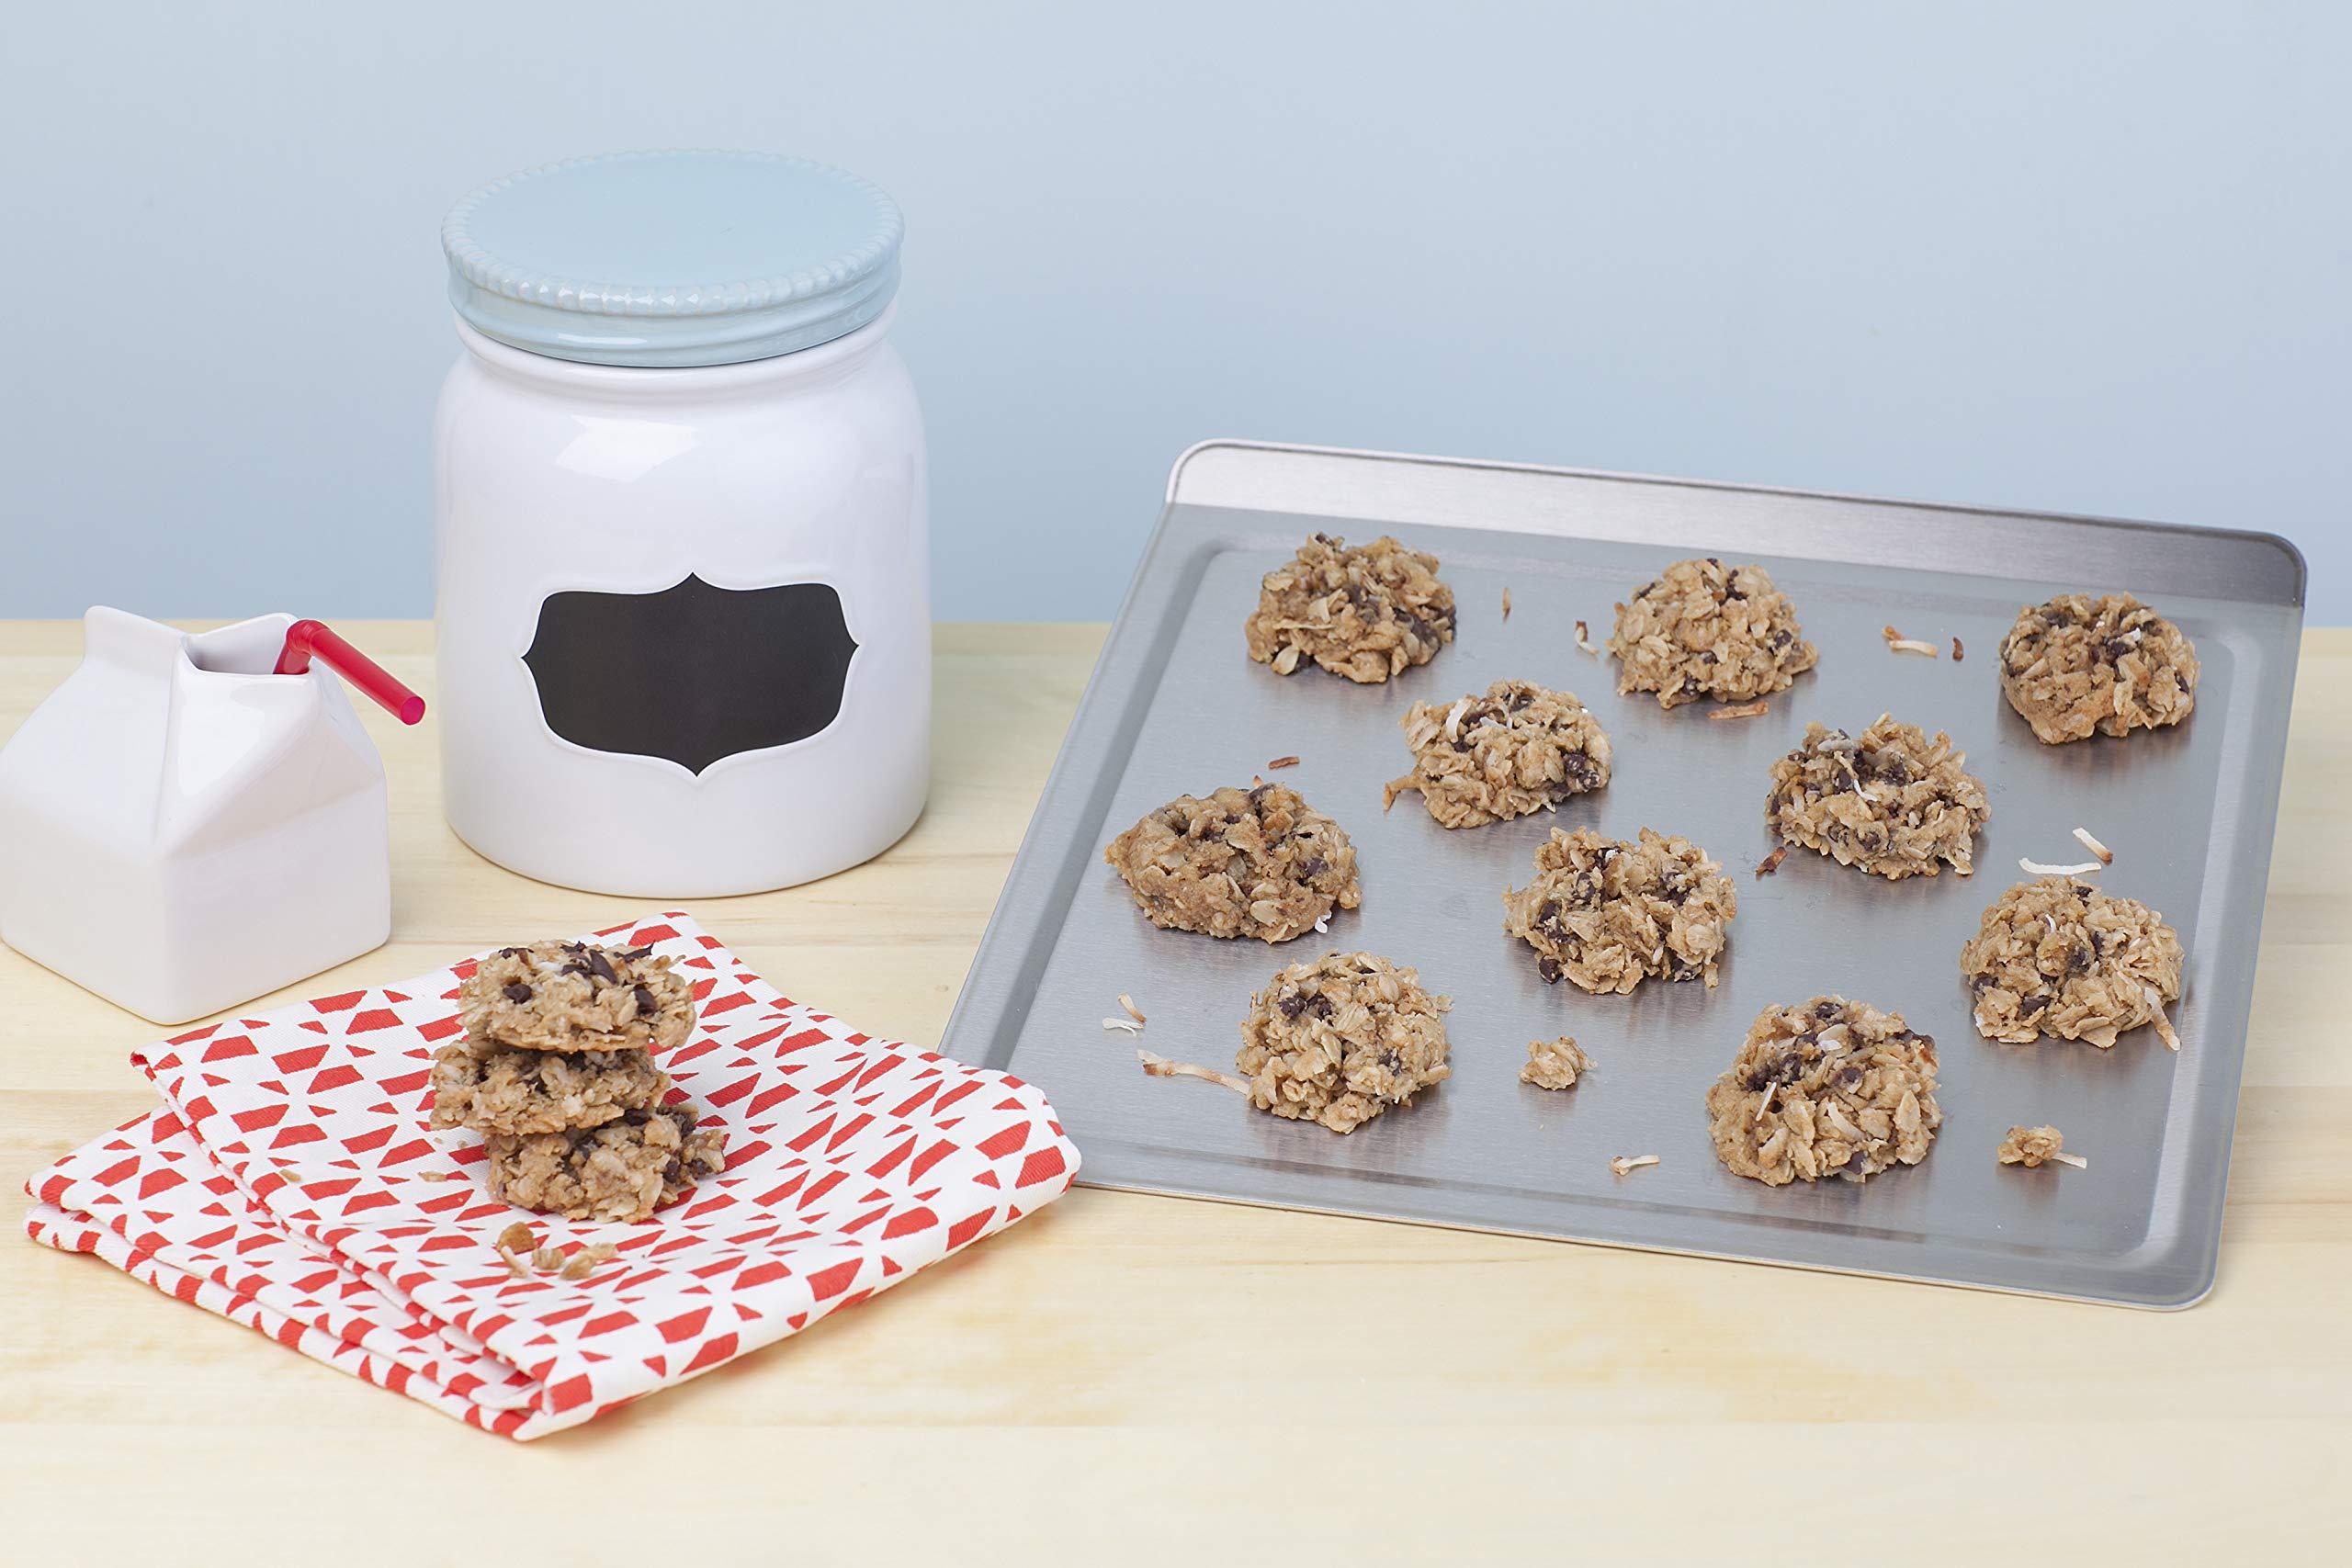 360 Cookware Stainless Steel Bakeware Cookie Baking Sheet, Medium, 12 X 12 Inch